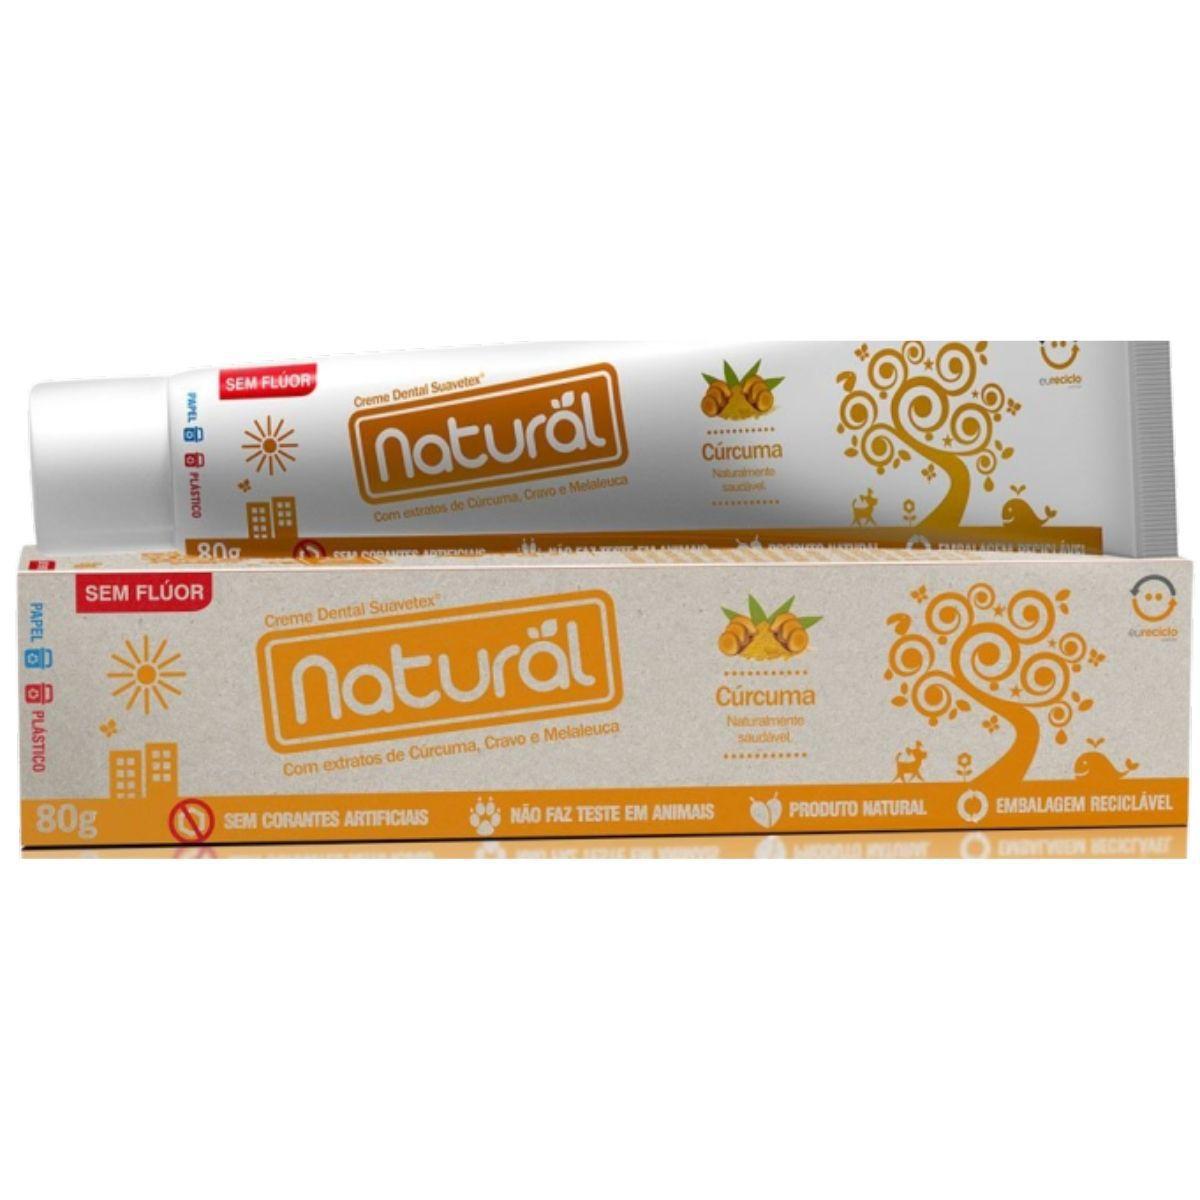 Kit Creme Dental Cúrcuma 80g + Escova Dental Carvão Vegetal + Enxaguante Bucal Cúrcuma 250ml + Sabonete de Cúrcuma 80gr - Orgânico Natural Boni